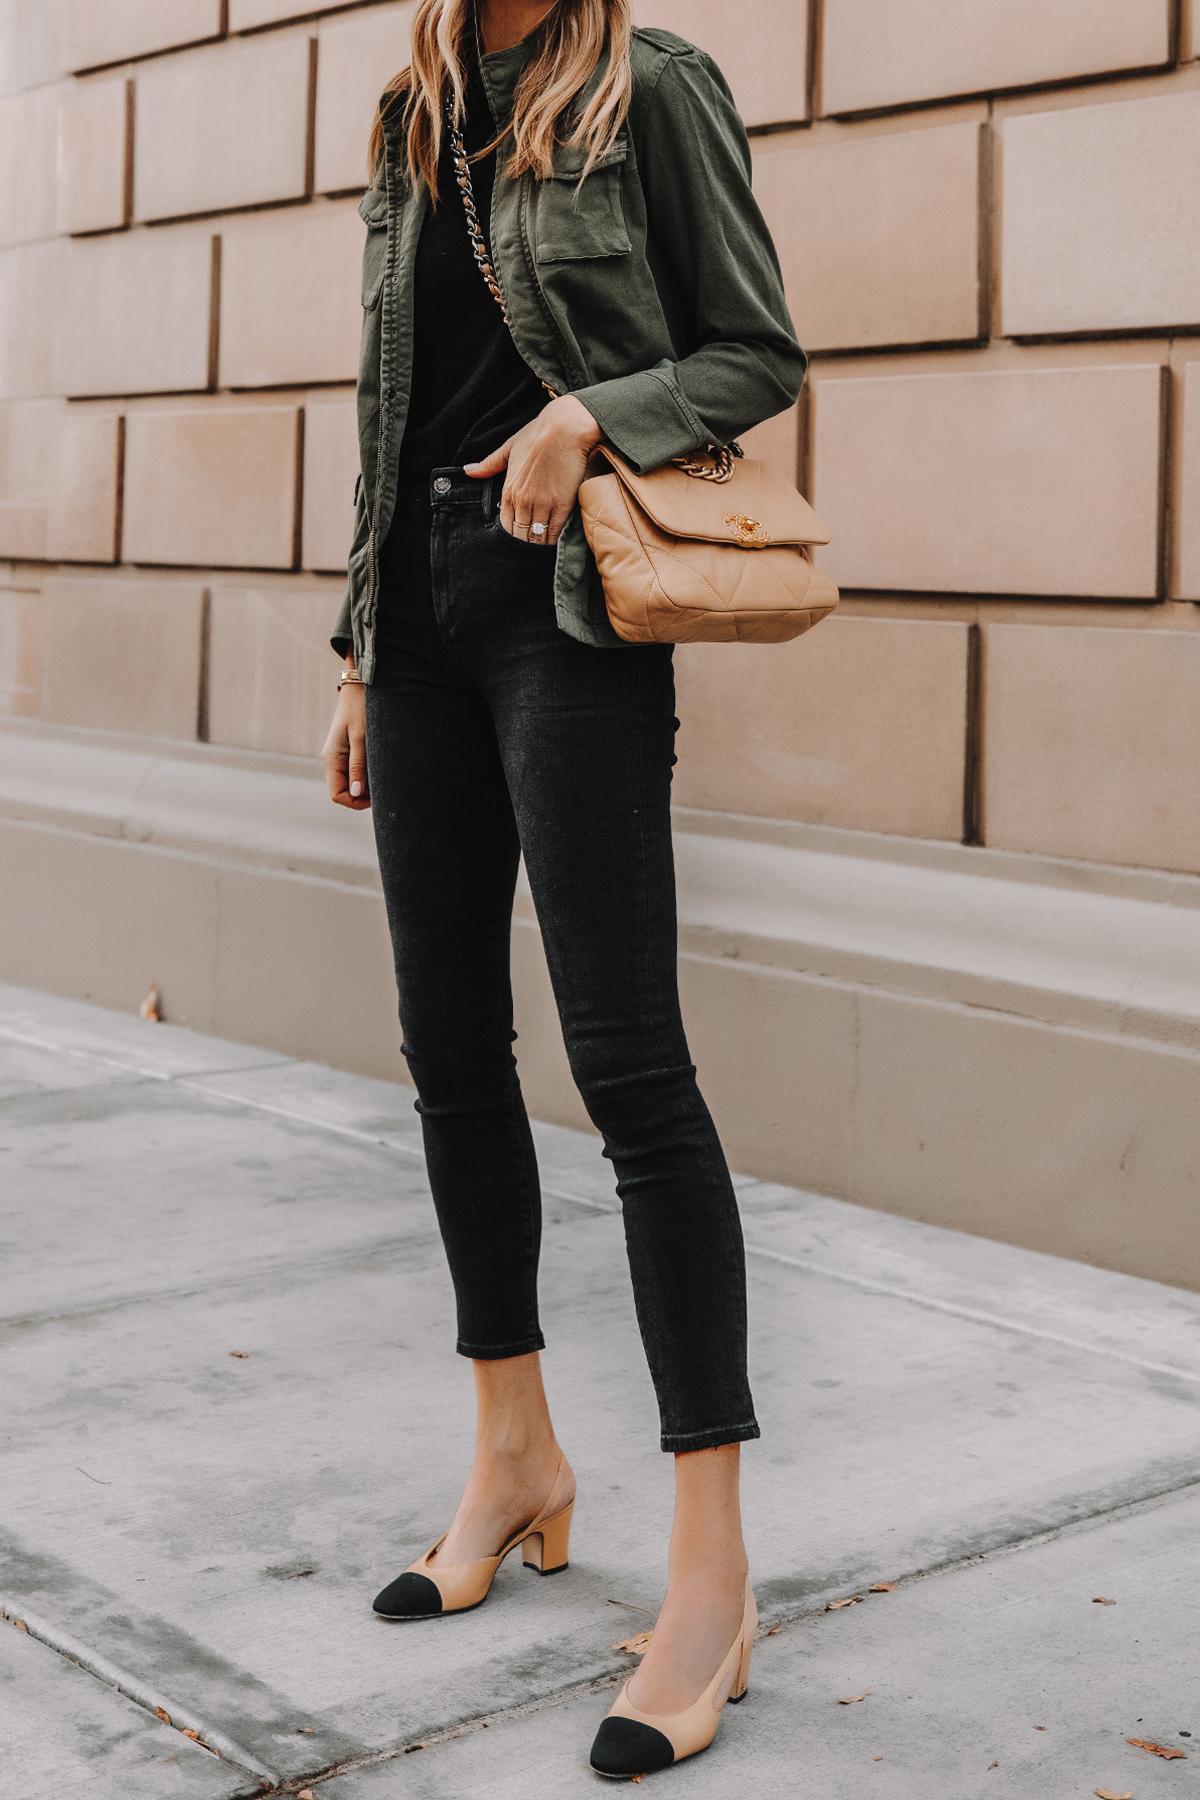 Fashion Jackson Wearing Anine Bing Green Utility Jacket Black Skinny Jeans Chanel Slingbacks Chanel 19 Small Dark Beige Handbag